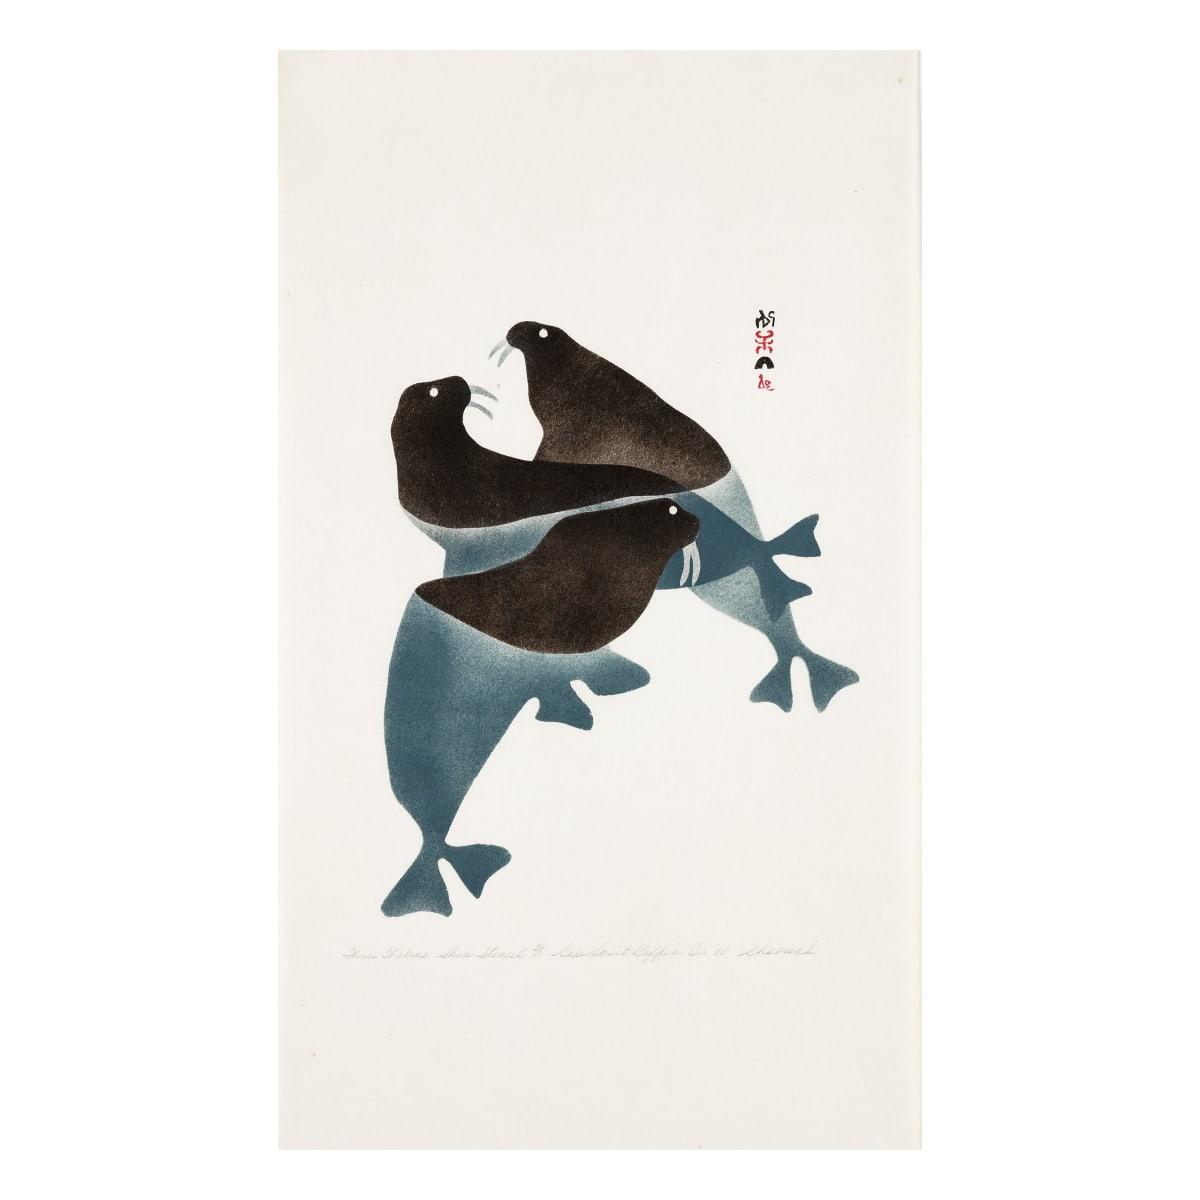 SHEOUAK PETAULASSIE (1923-1961) KINNGAIT (CAPE DORSET) Three Walrus, 1960 REALIZED: $5,280